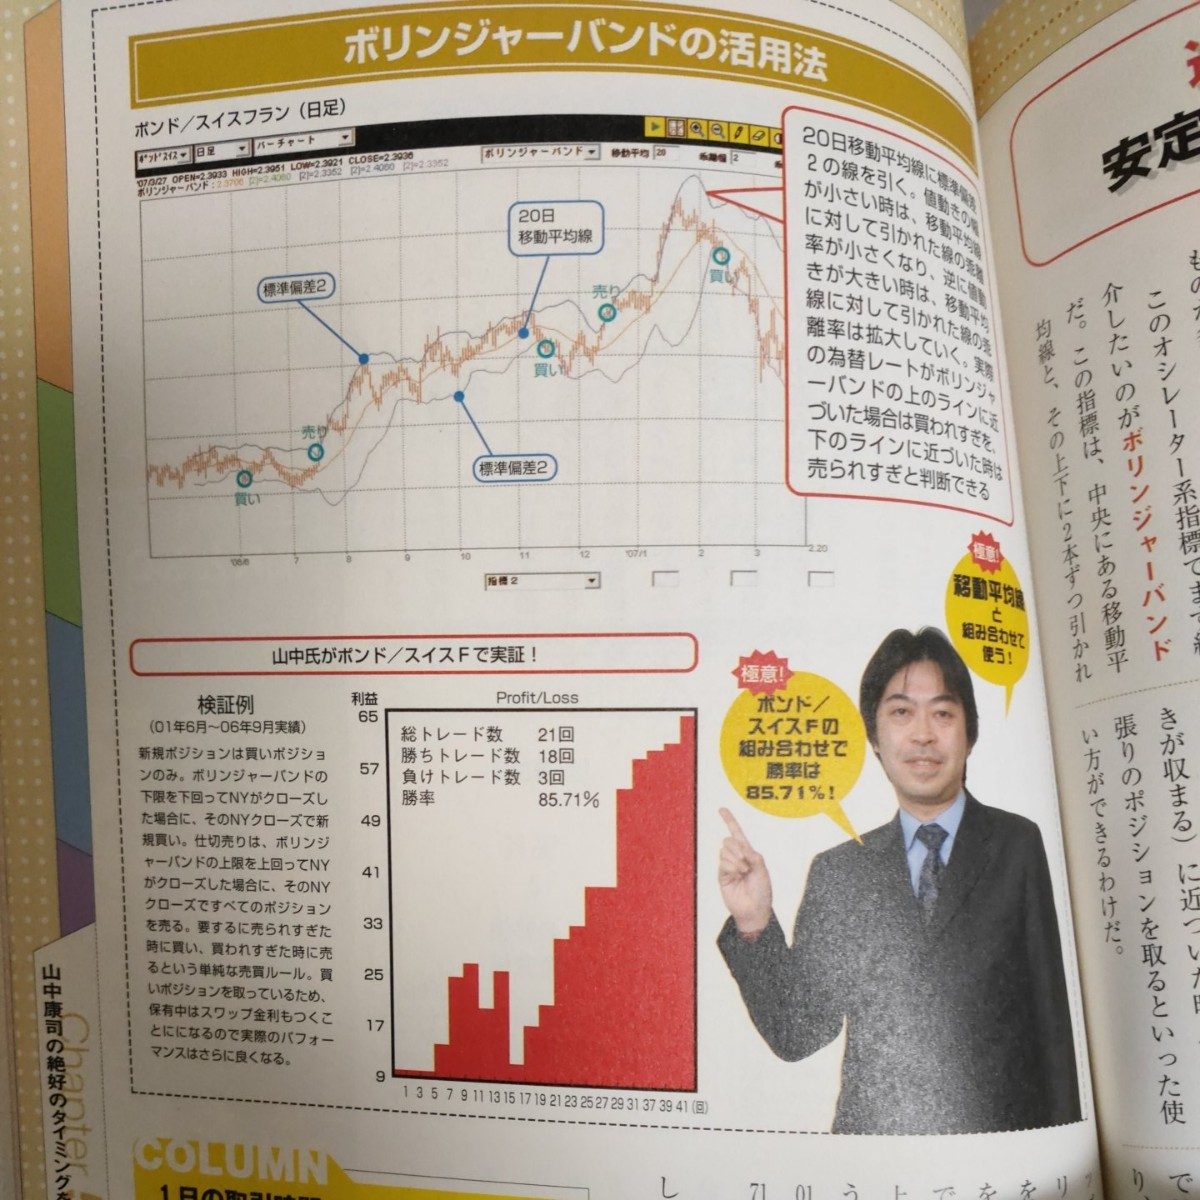 FX投資 実戦マニュアル   実業之日本社